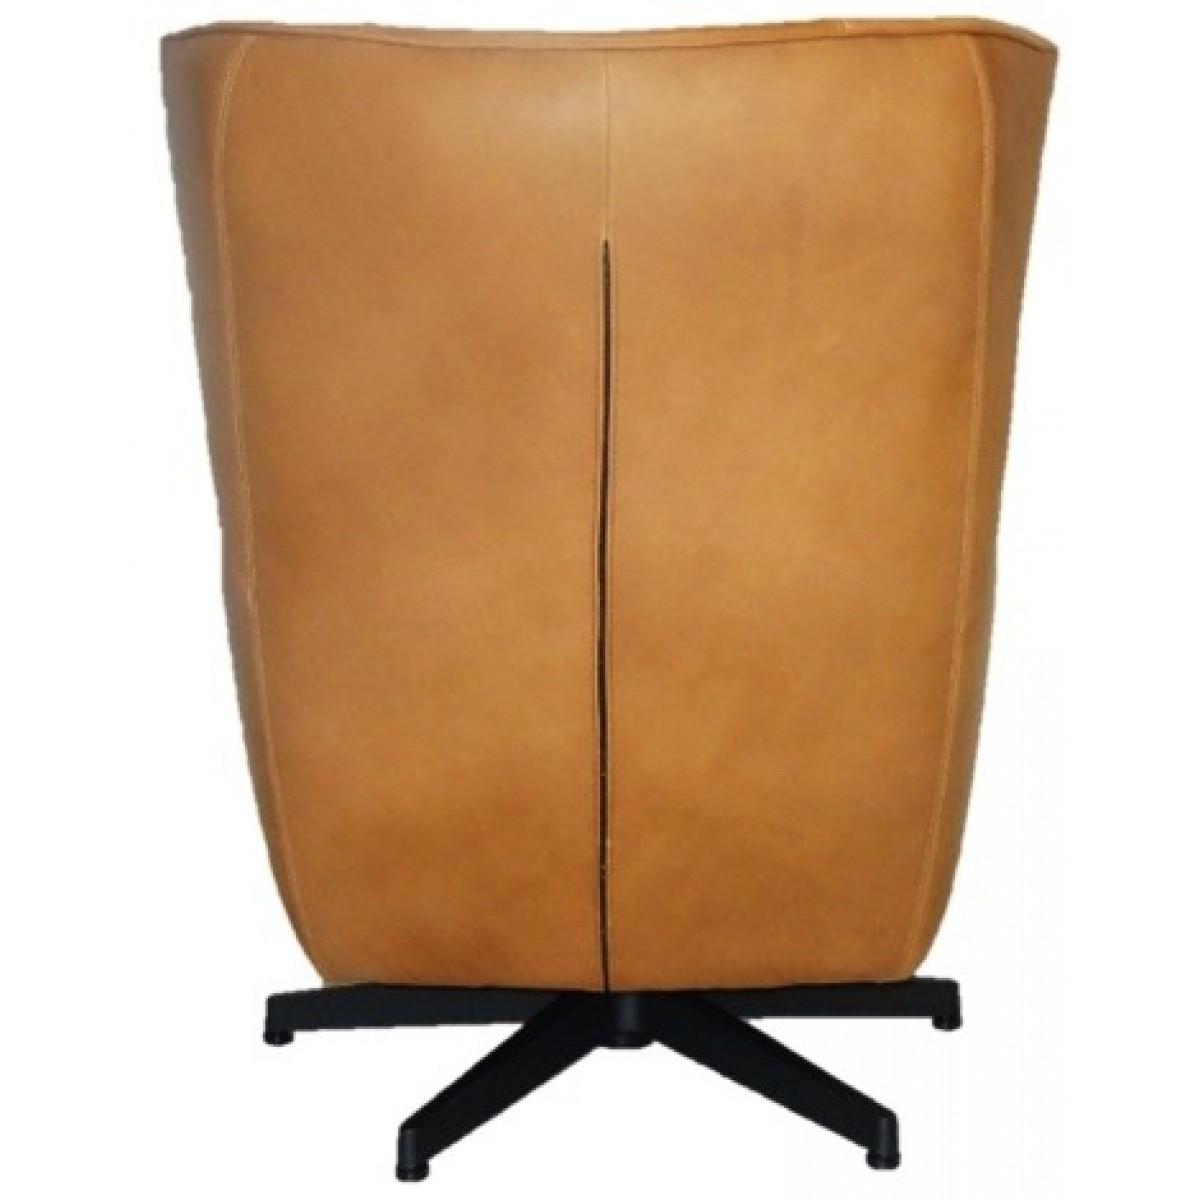 carmelo-draaifauteil-leder-cognac-he-design-leer-stof-achter